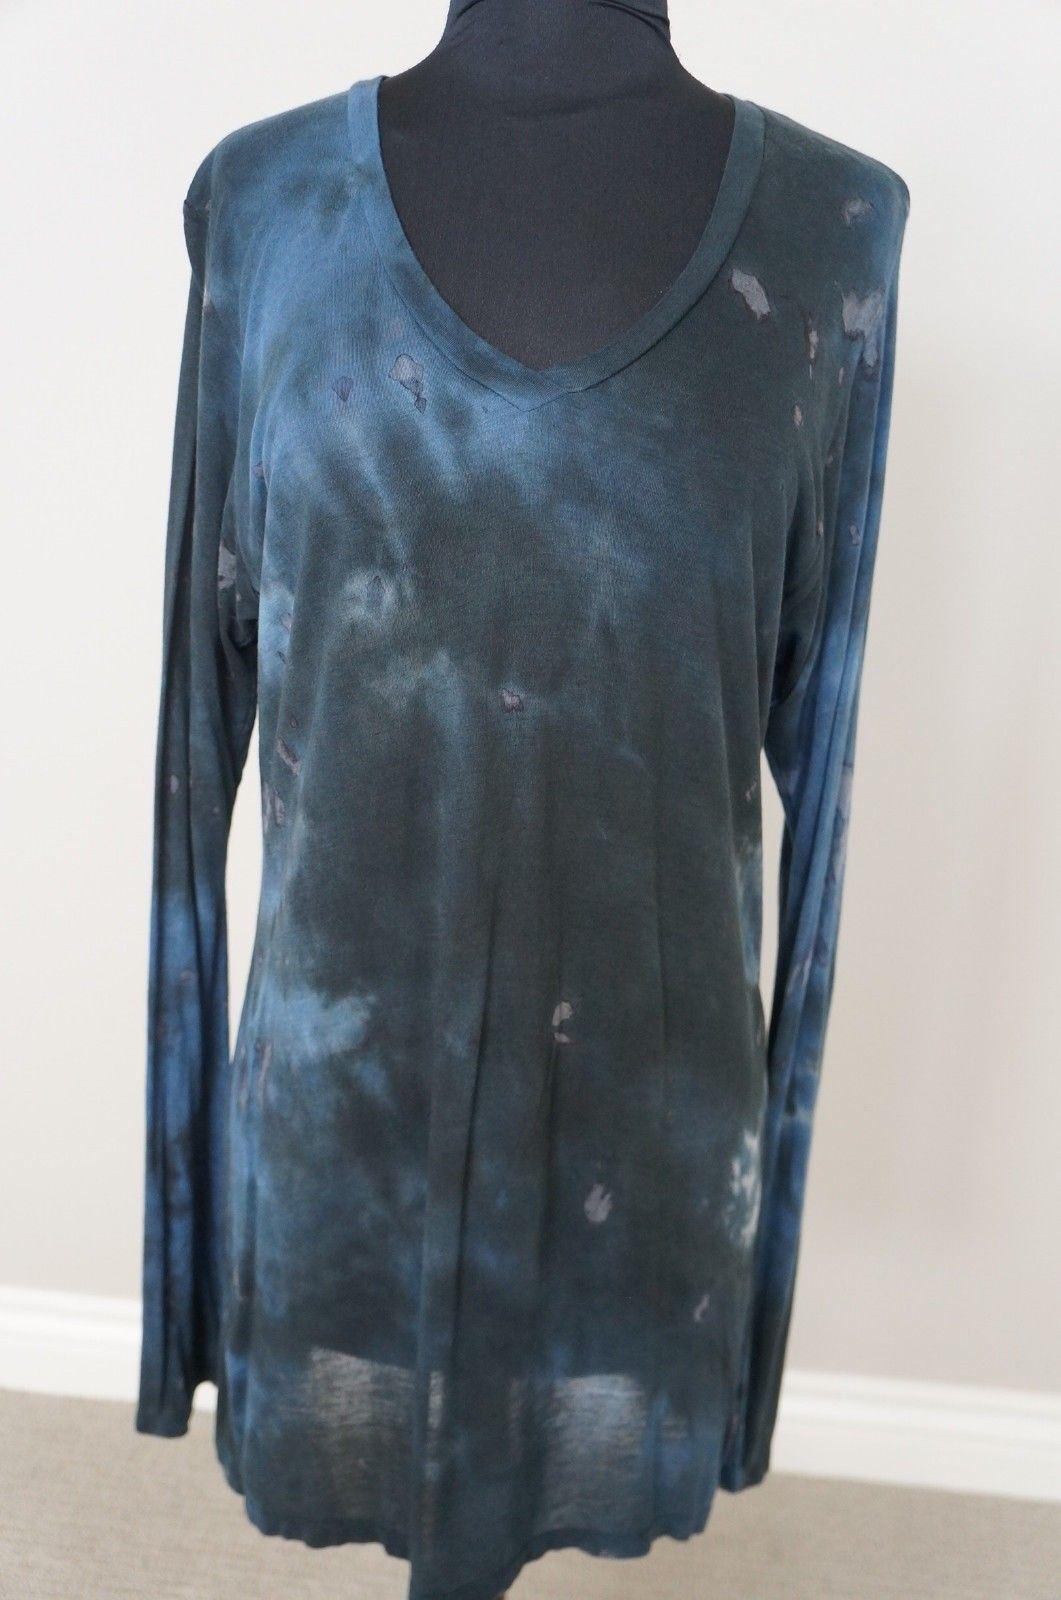 NEW Johnny Was Pete&Greta Long Sleeve Tie Dye Modal Tee Tunic Top Blouse Dress S